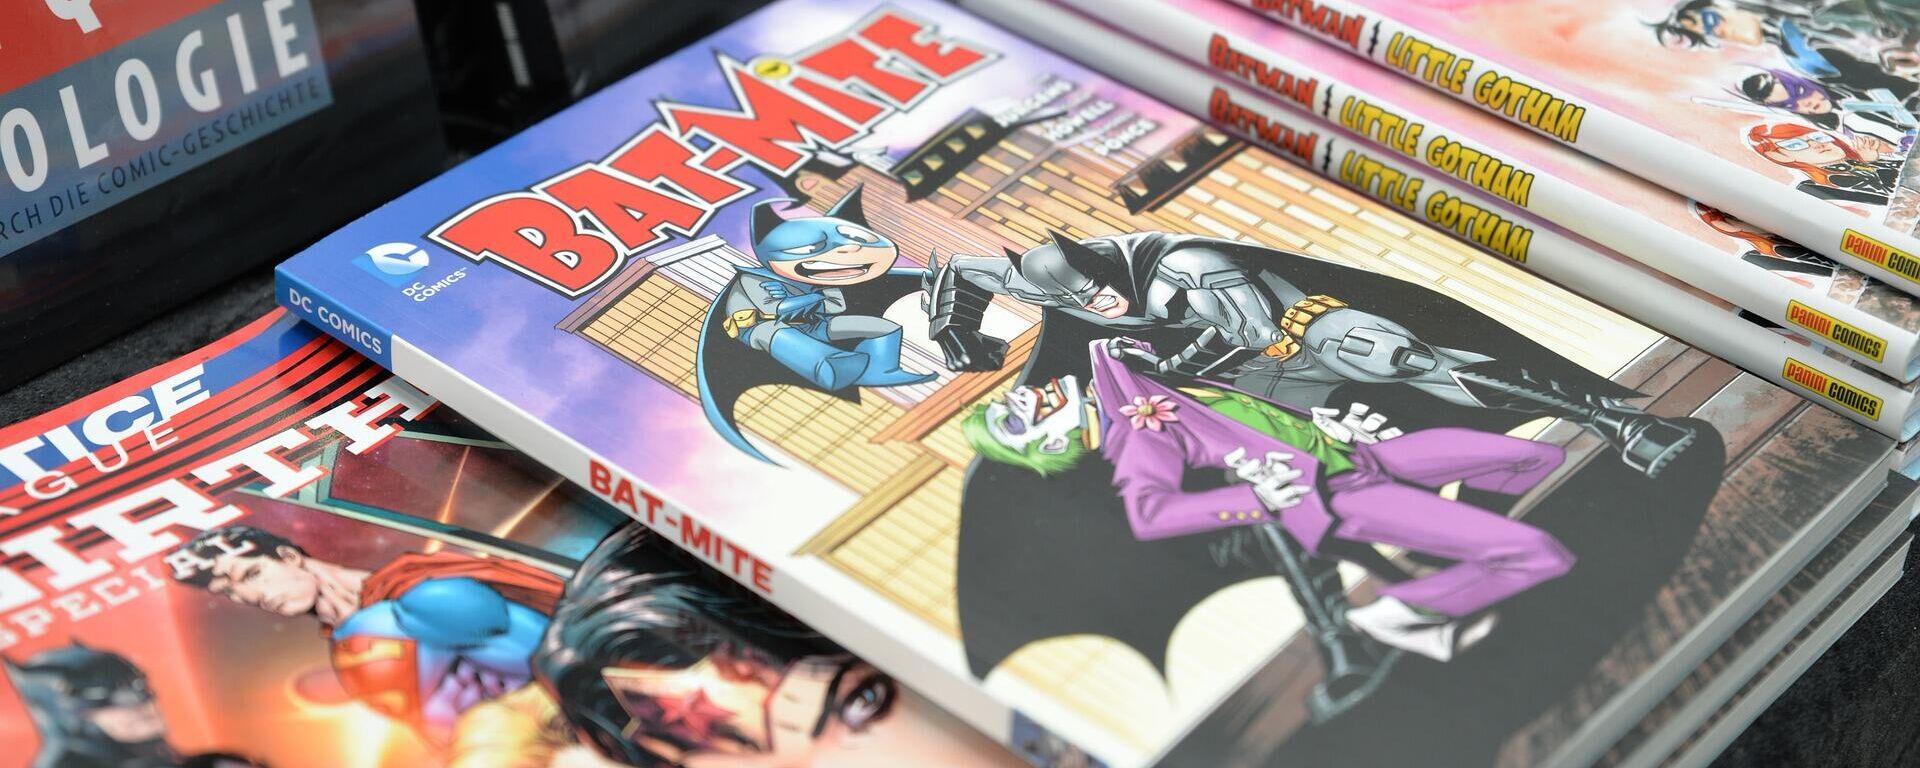 Comic-Bände des Verlags DC Comics (Archiv) - SNA, 1920, 13.12.2020